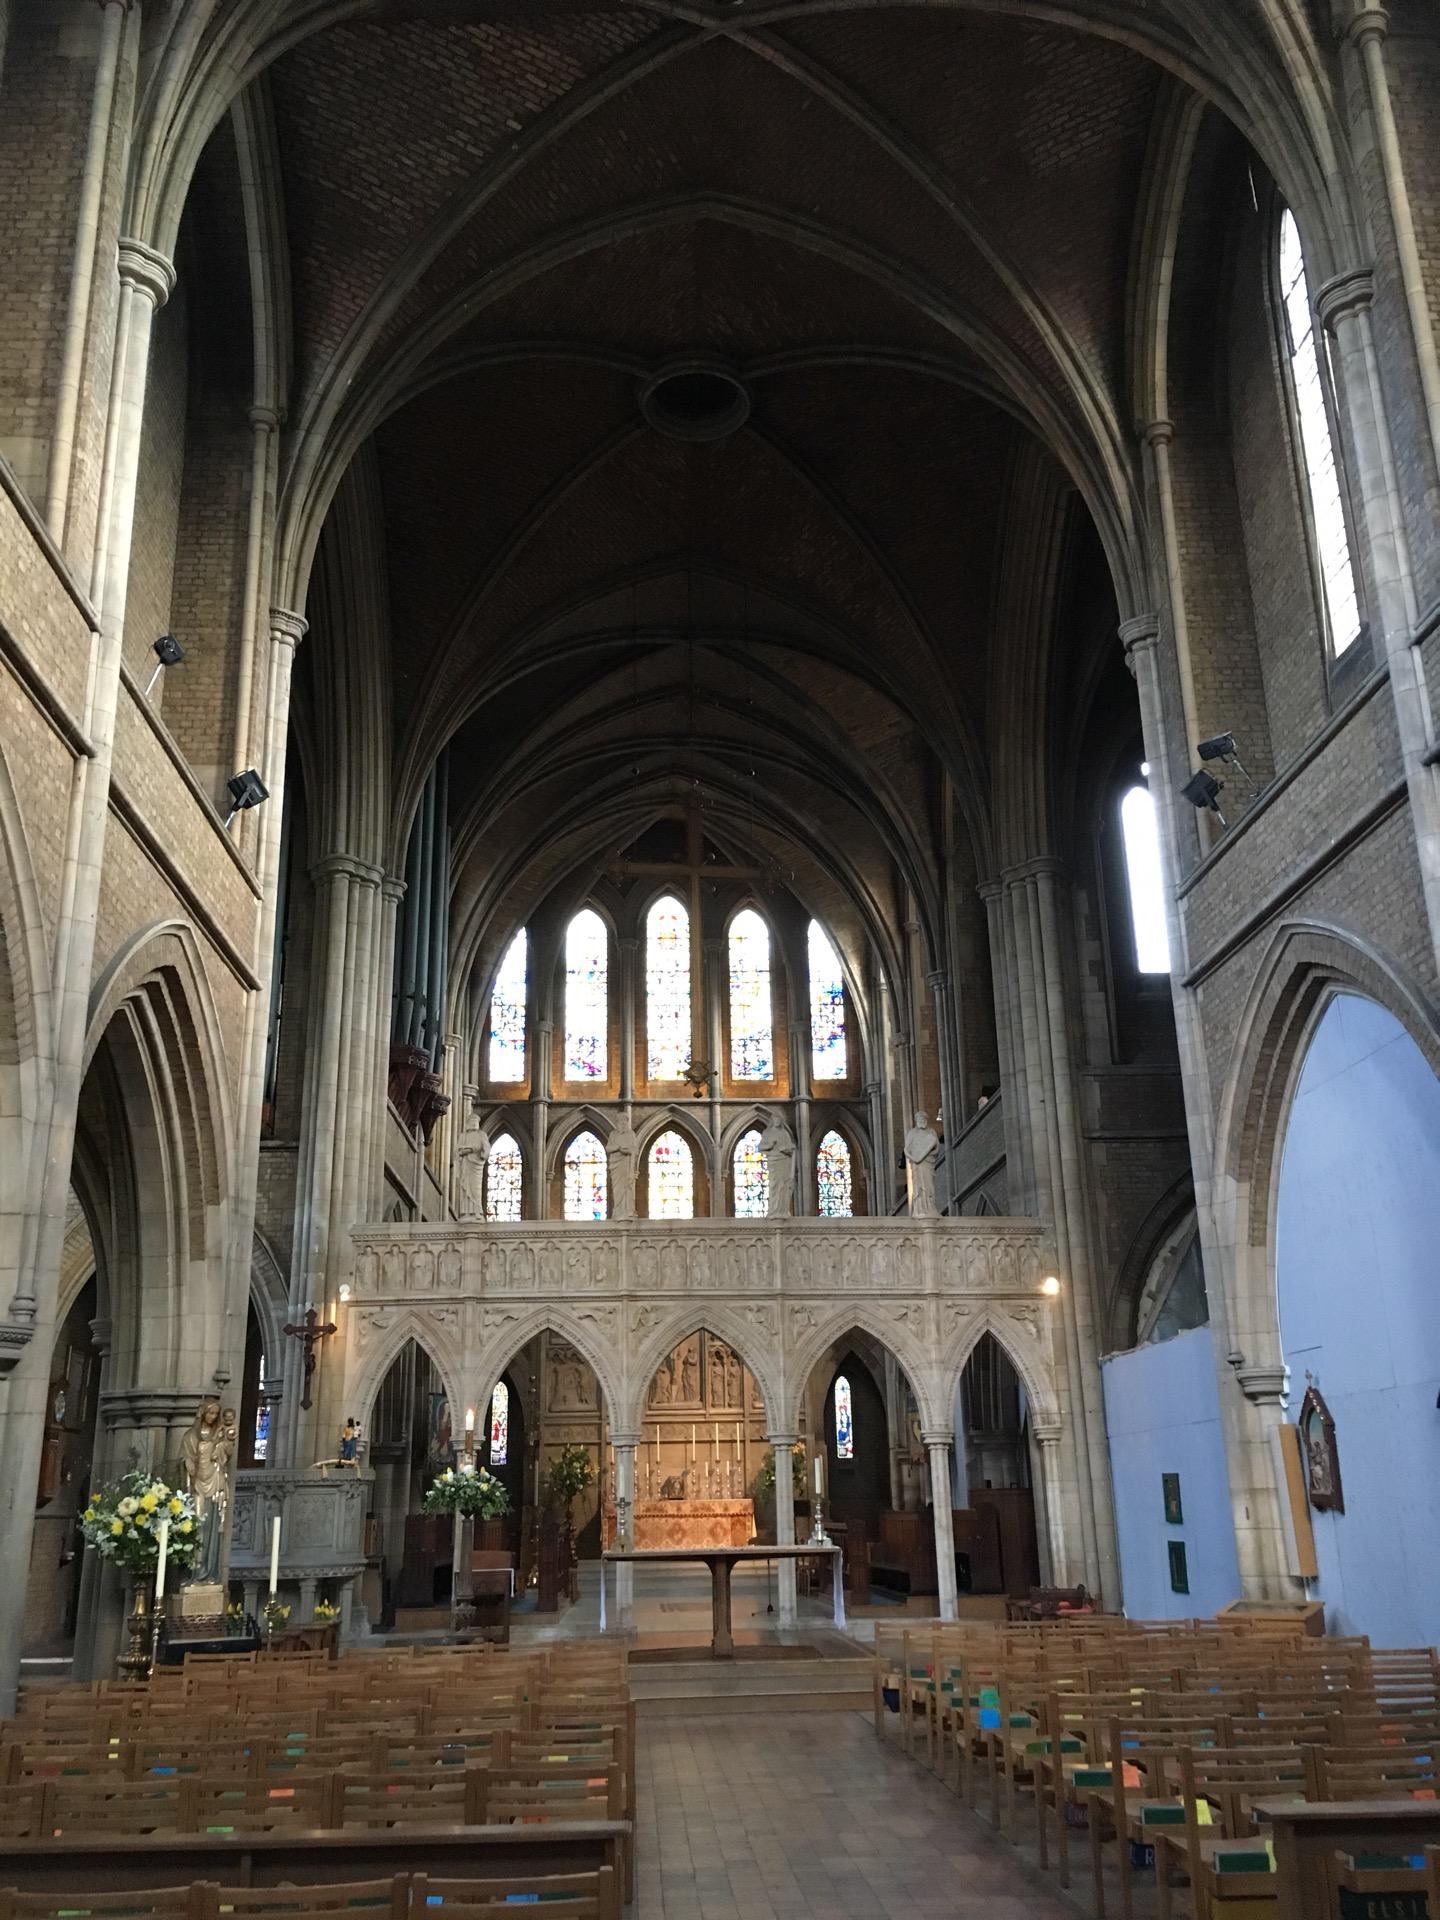 St. John The Evangelist C Of E Church   2 Sylvan Rd, London SE19 2RX   +44 20 8771 6686